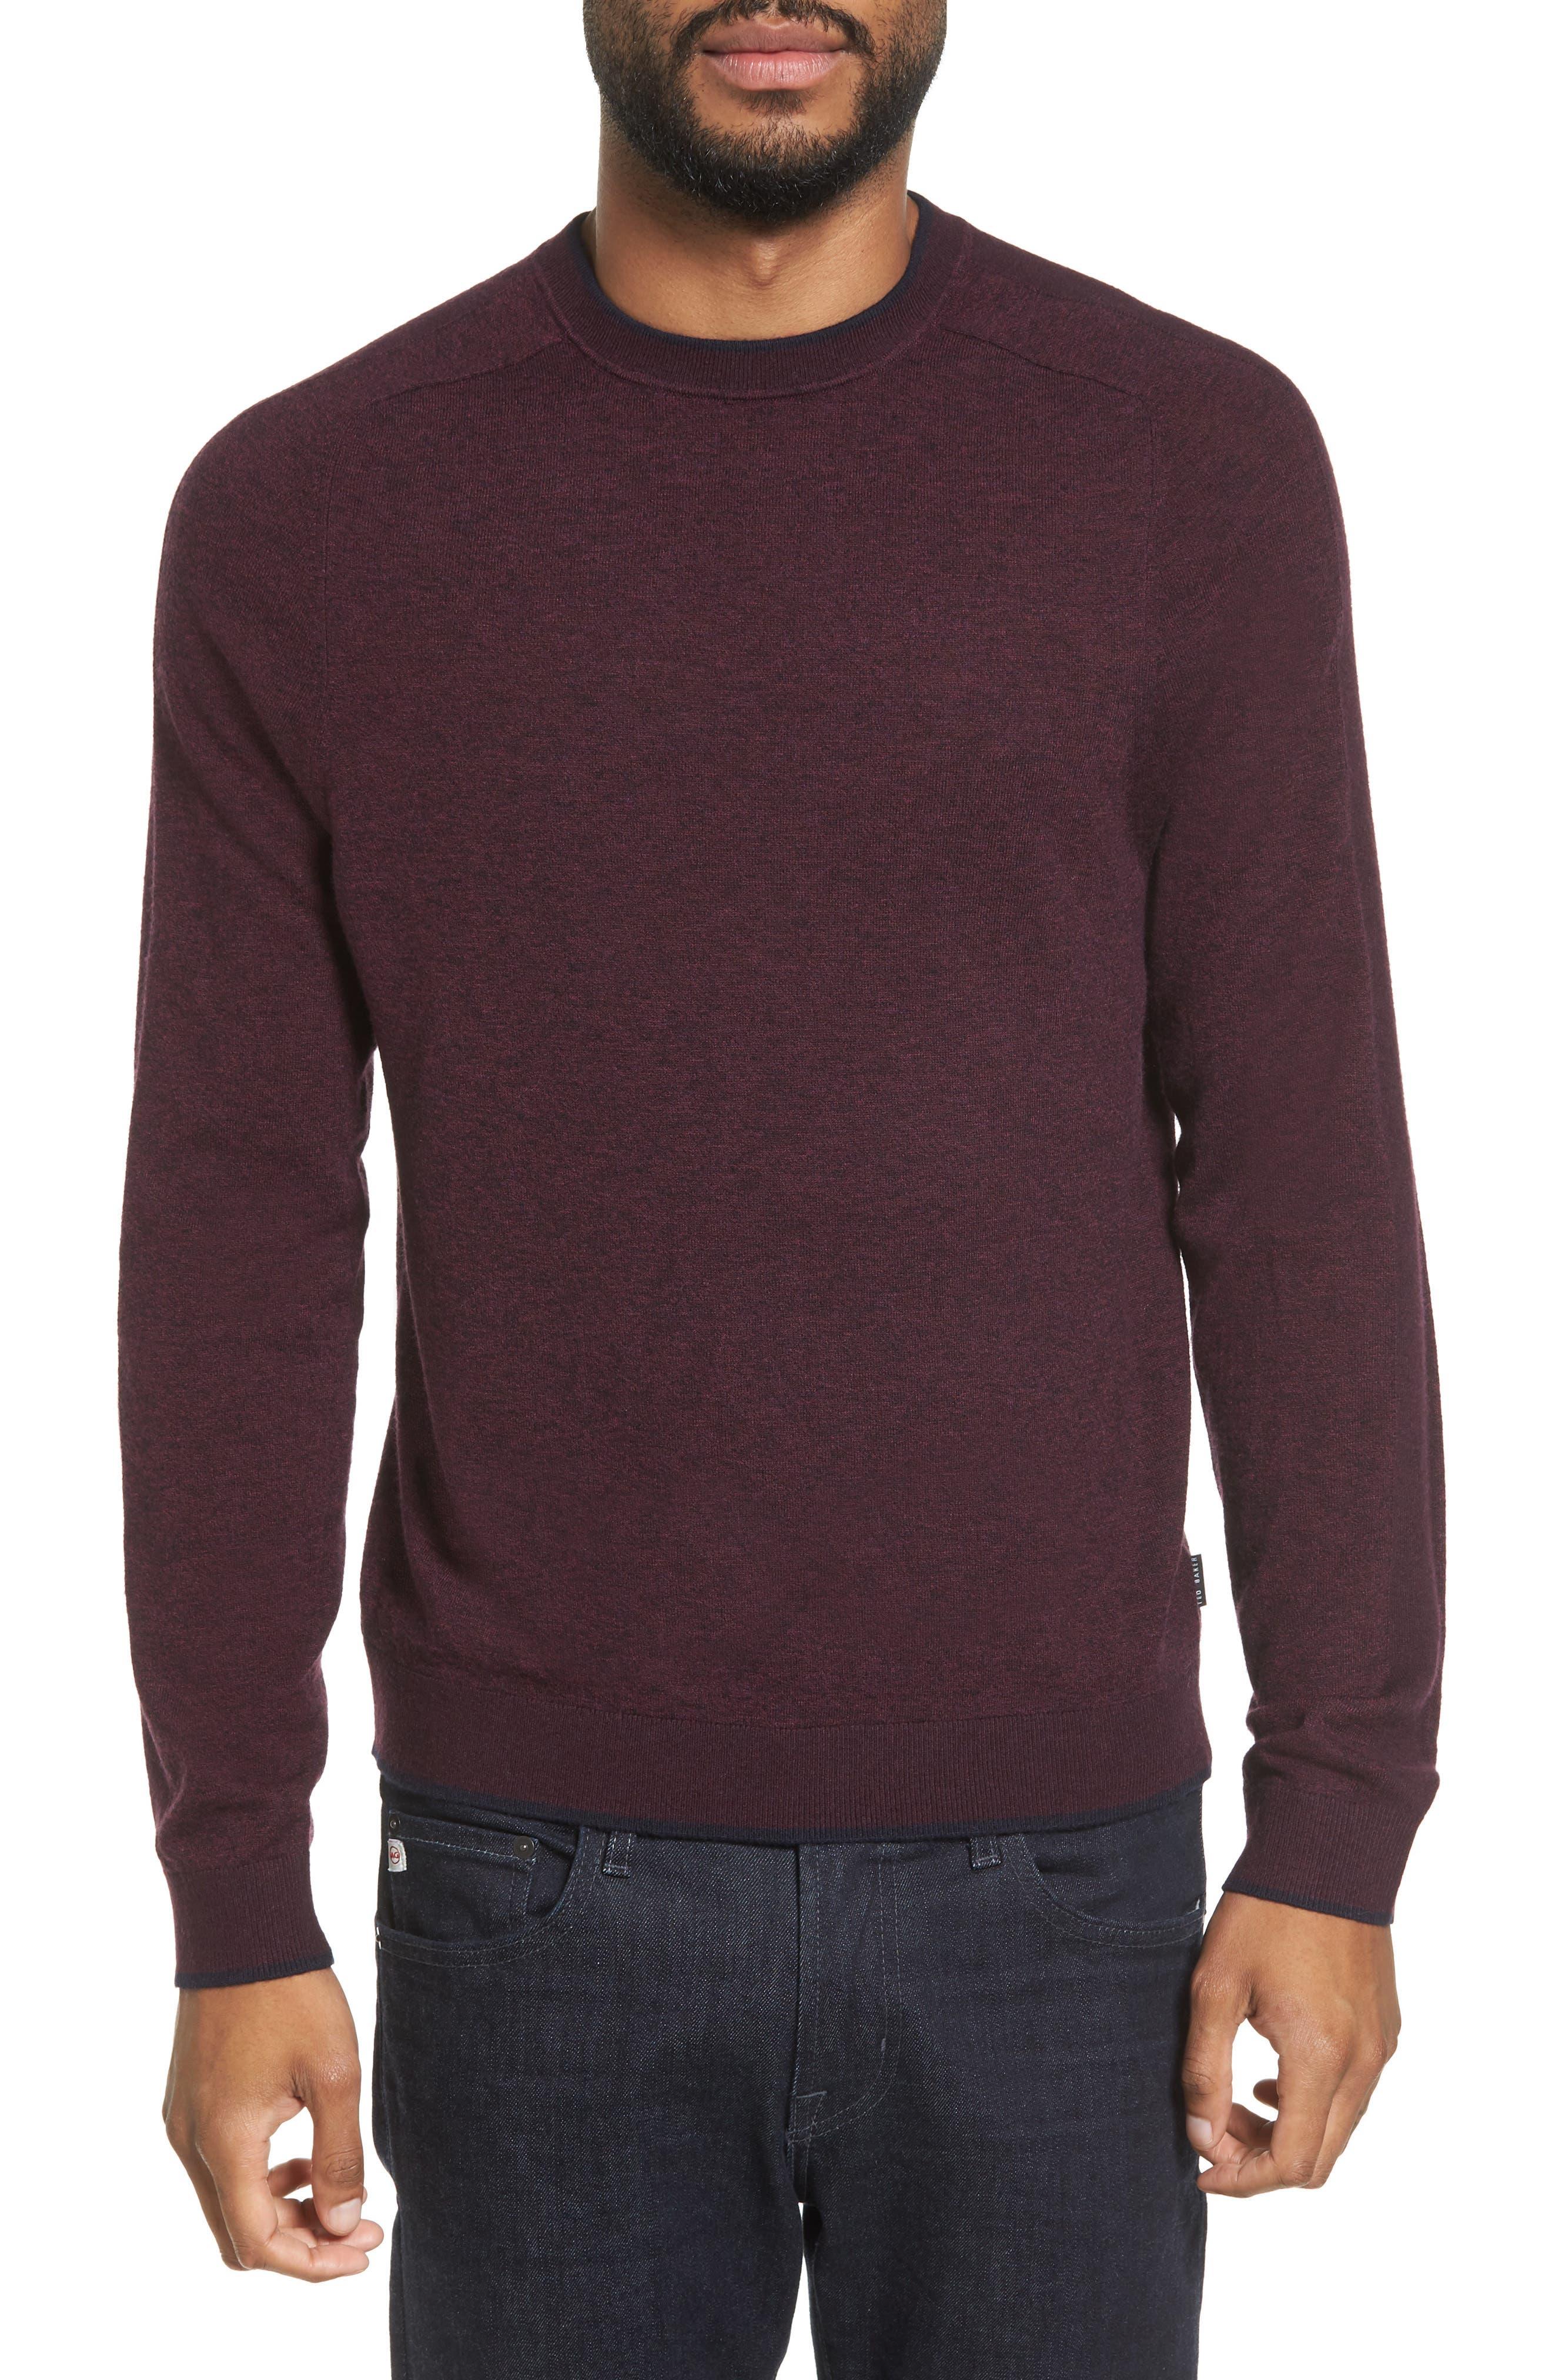 Alternate Image 1 Selected - Ted Baker London Norpol Crewneck Sweater